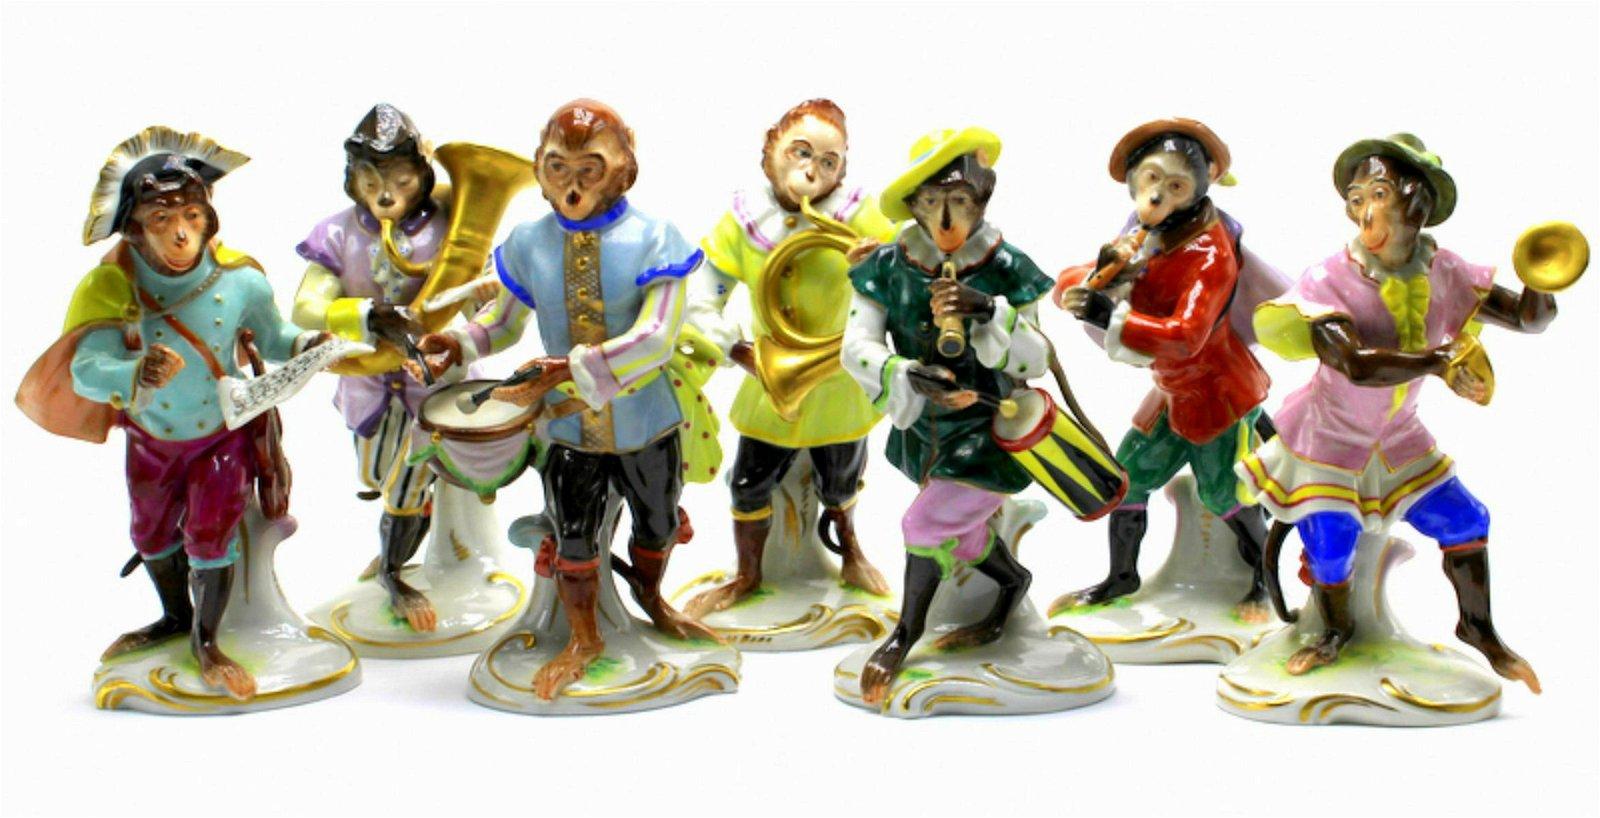 Lot of 7 Germany Porcelain Monkey Band Figurines